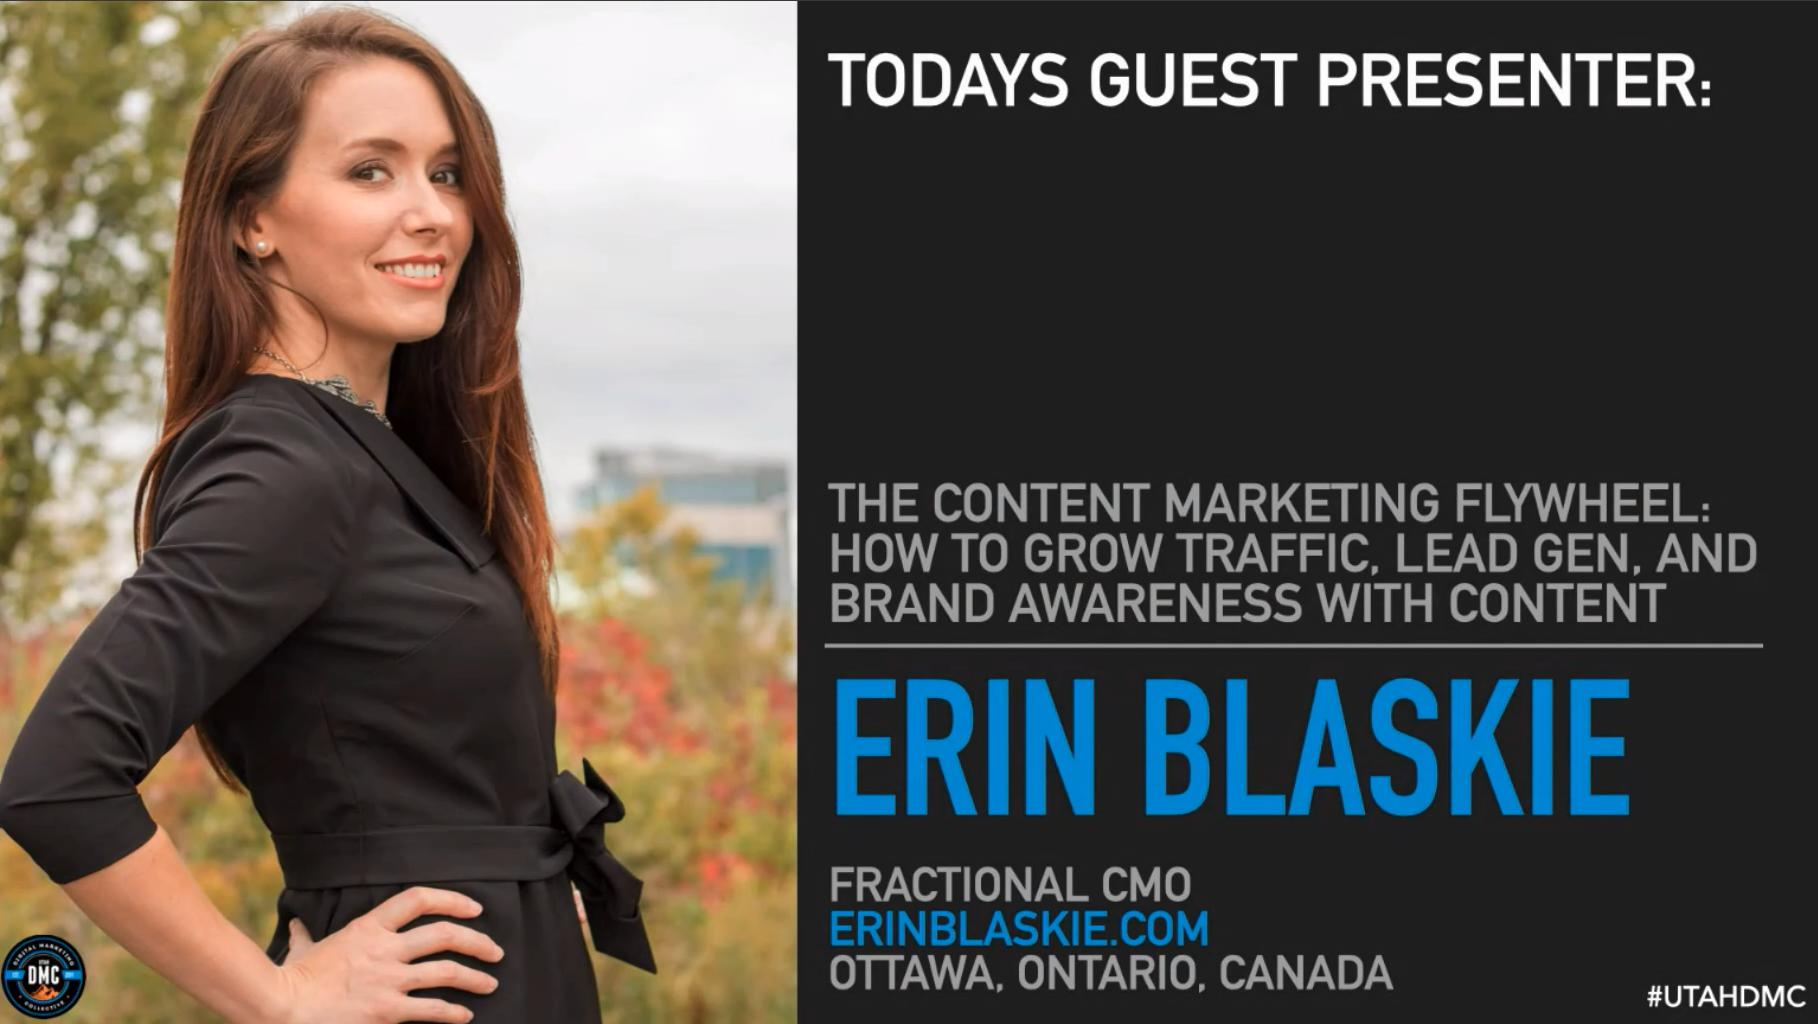 Erin Blaskie - Utah DMC Feb 24 2021 - The Content Marketing Flywheel